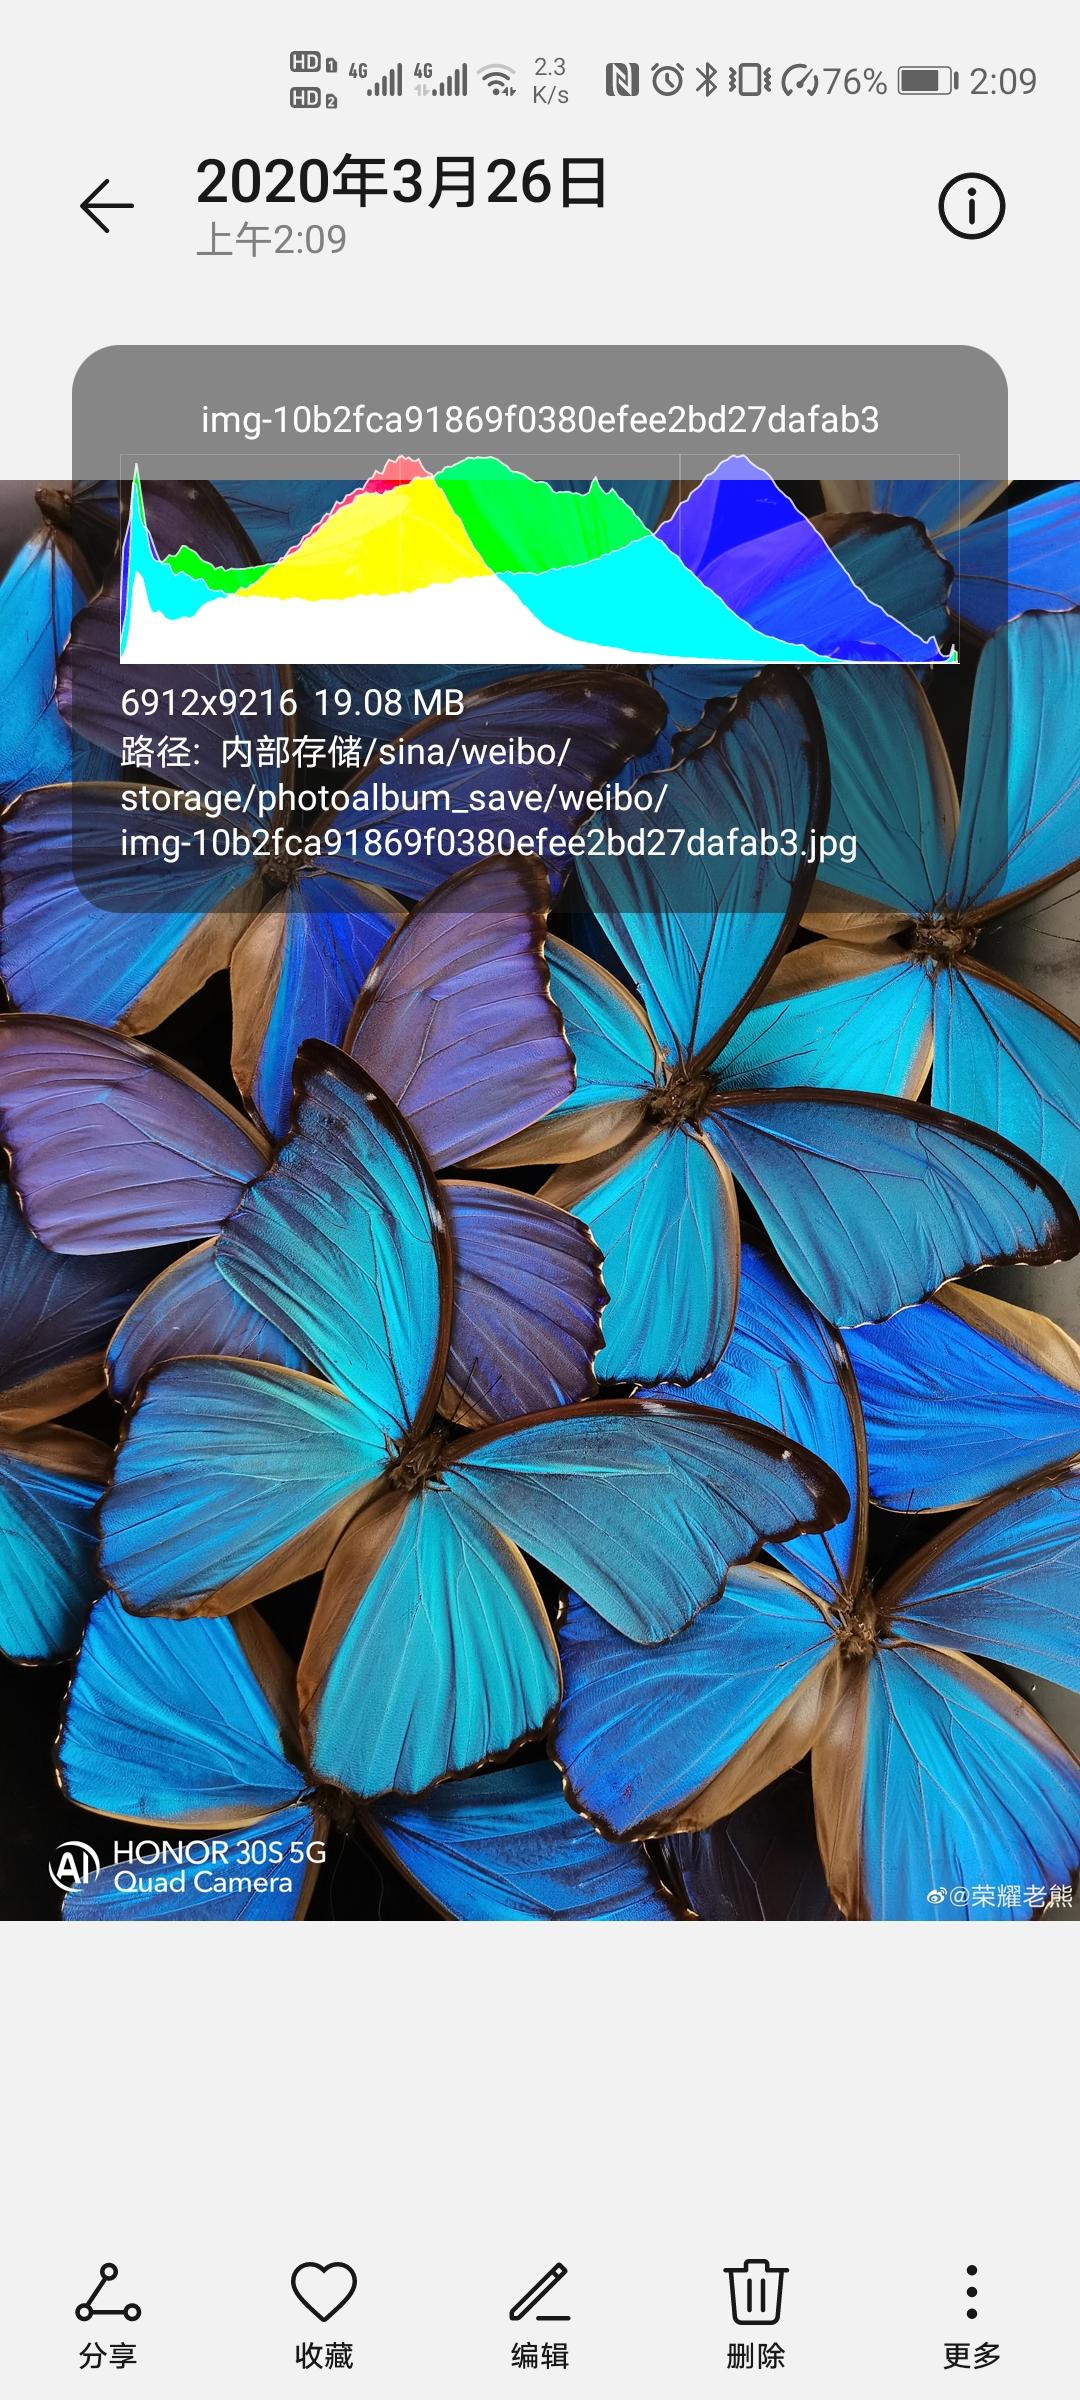 Screenshot_20200326_020953_com.android.gallery3d.jpg